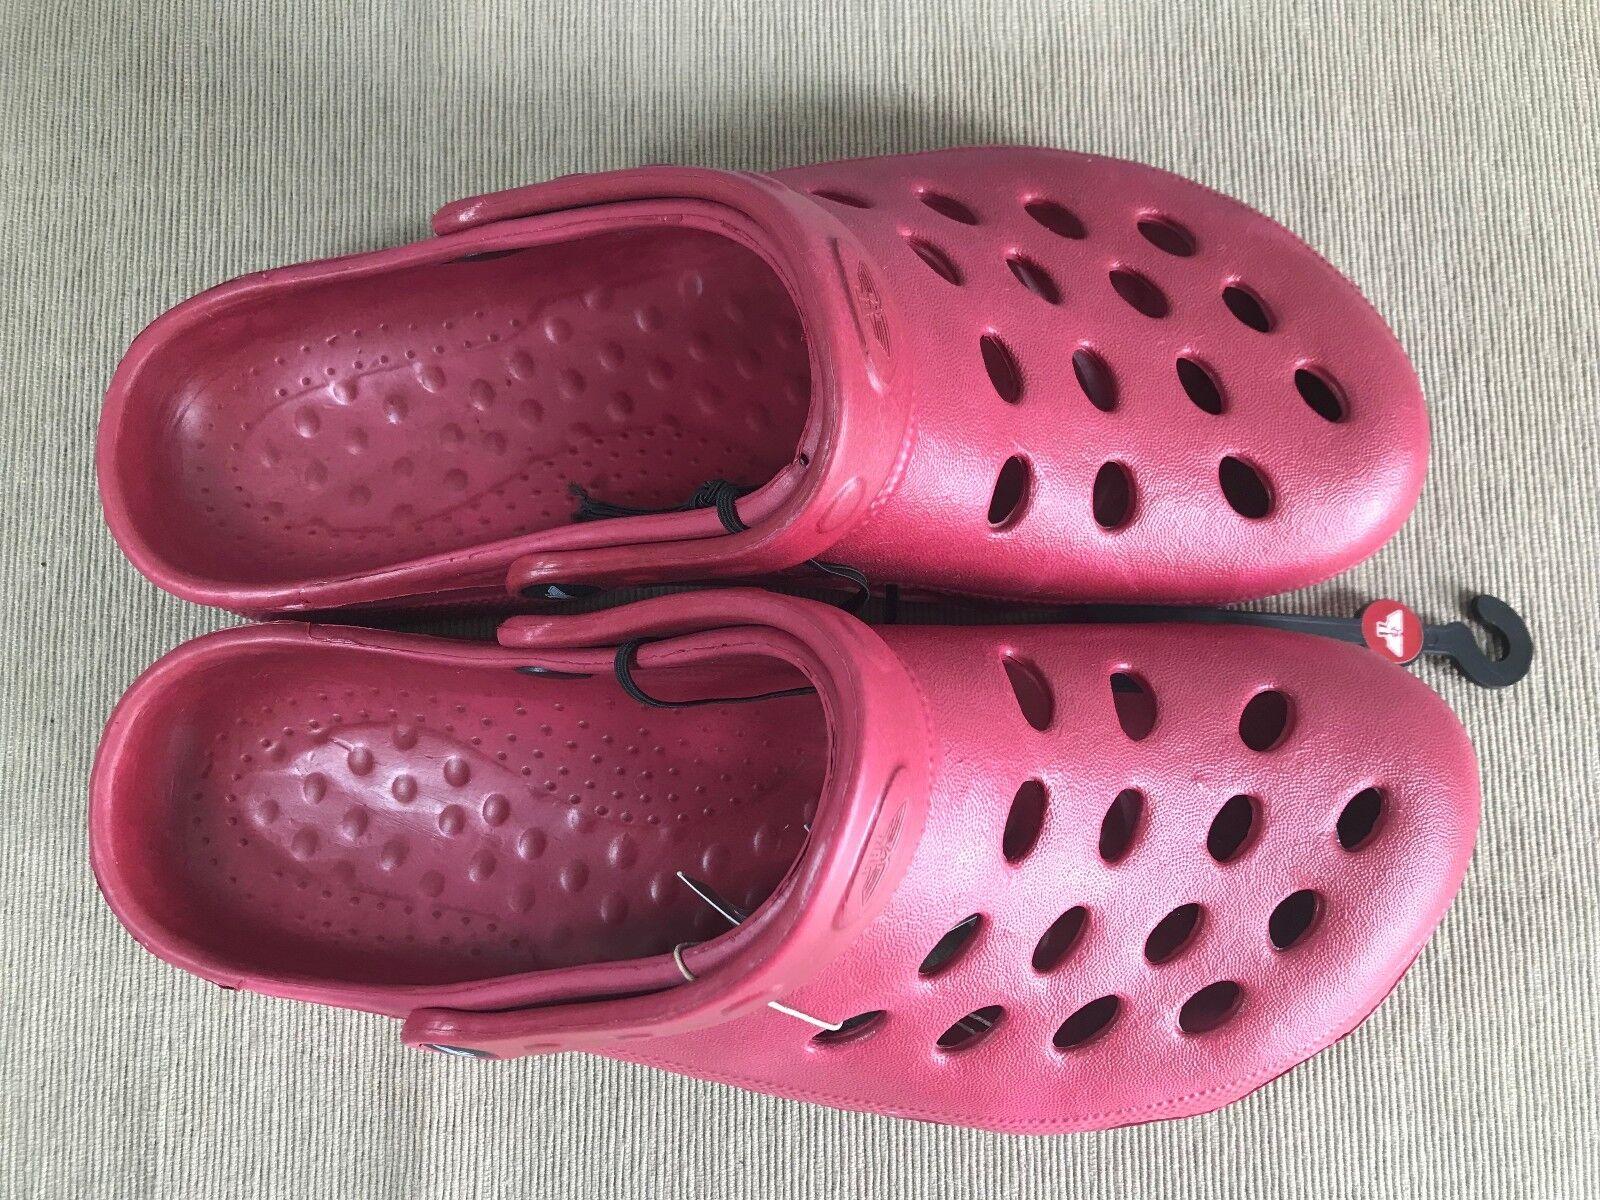 BNWT Mens Sz EURO 43 US 10 Rivers Sandals Doghouse Brand Burgundy Clog Sandals Rivers Shoes 699462